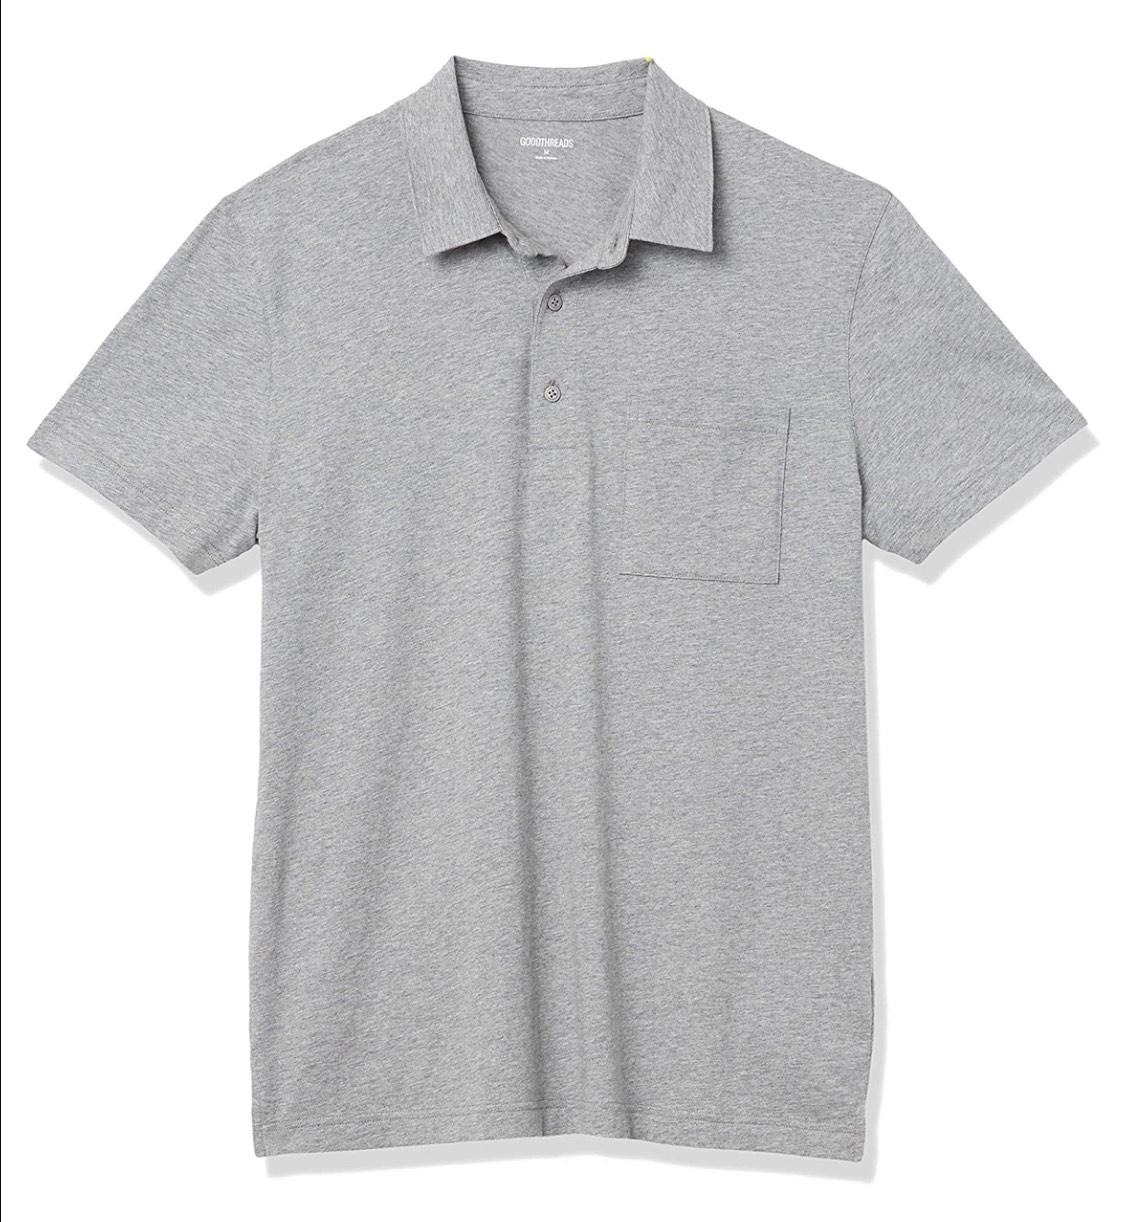 Polo bolsillo Goodthreads adulto talla S (Burdeos 5.92€, verde 6.80€)